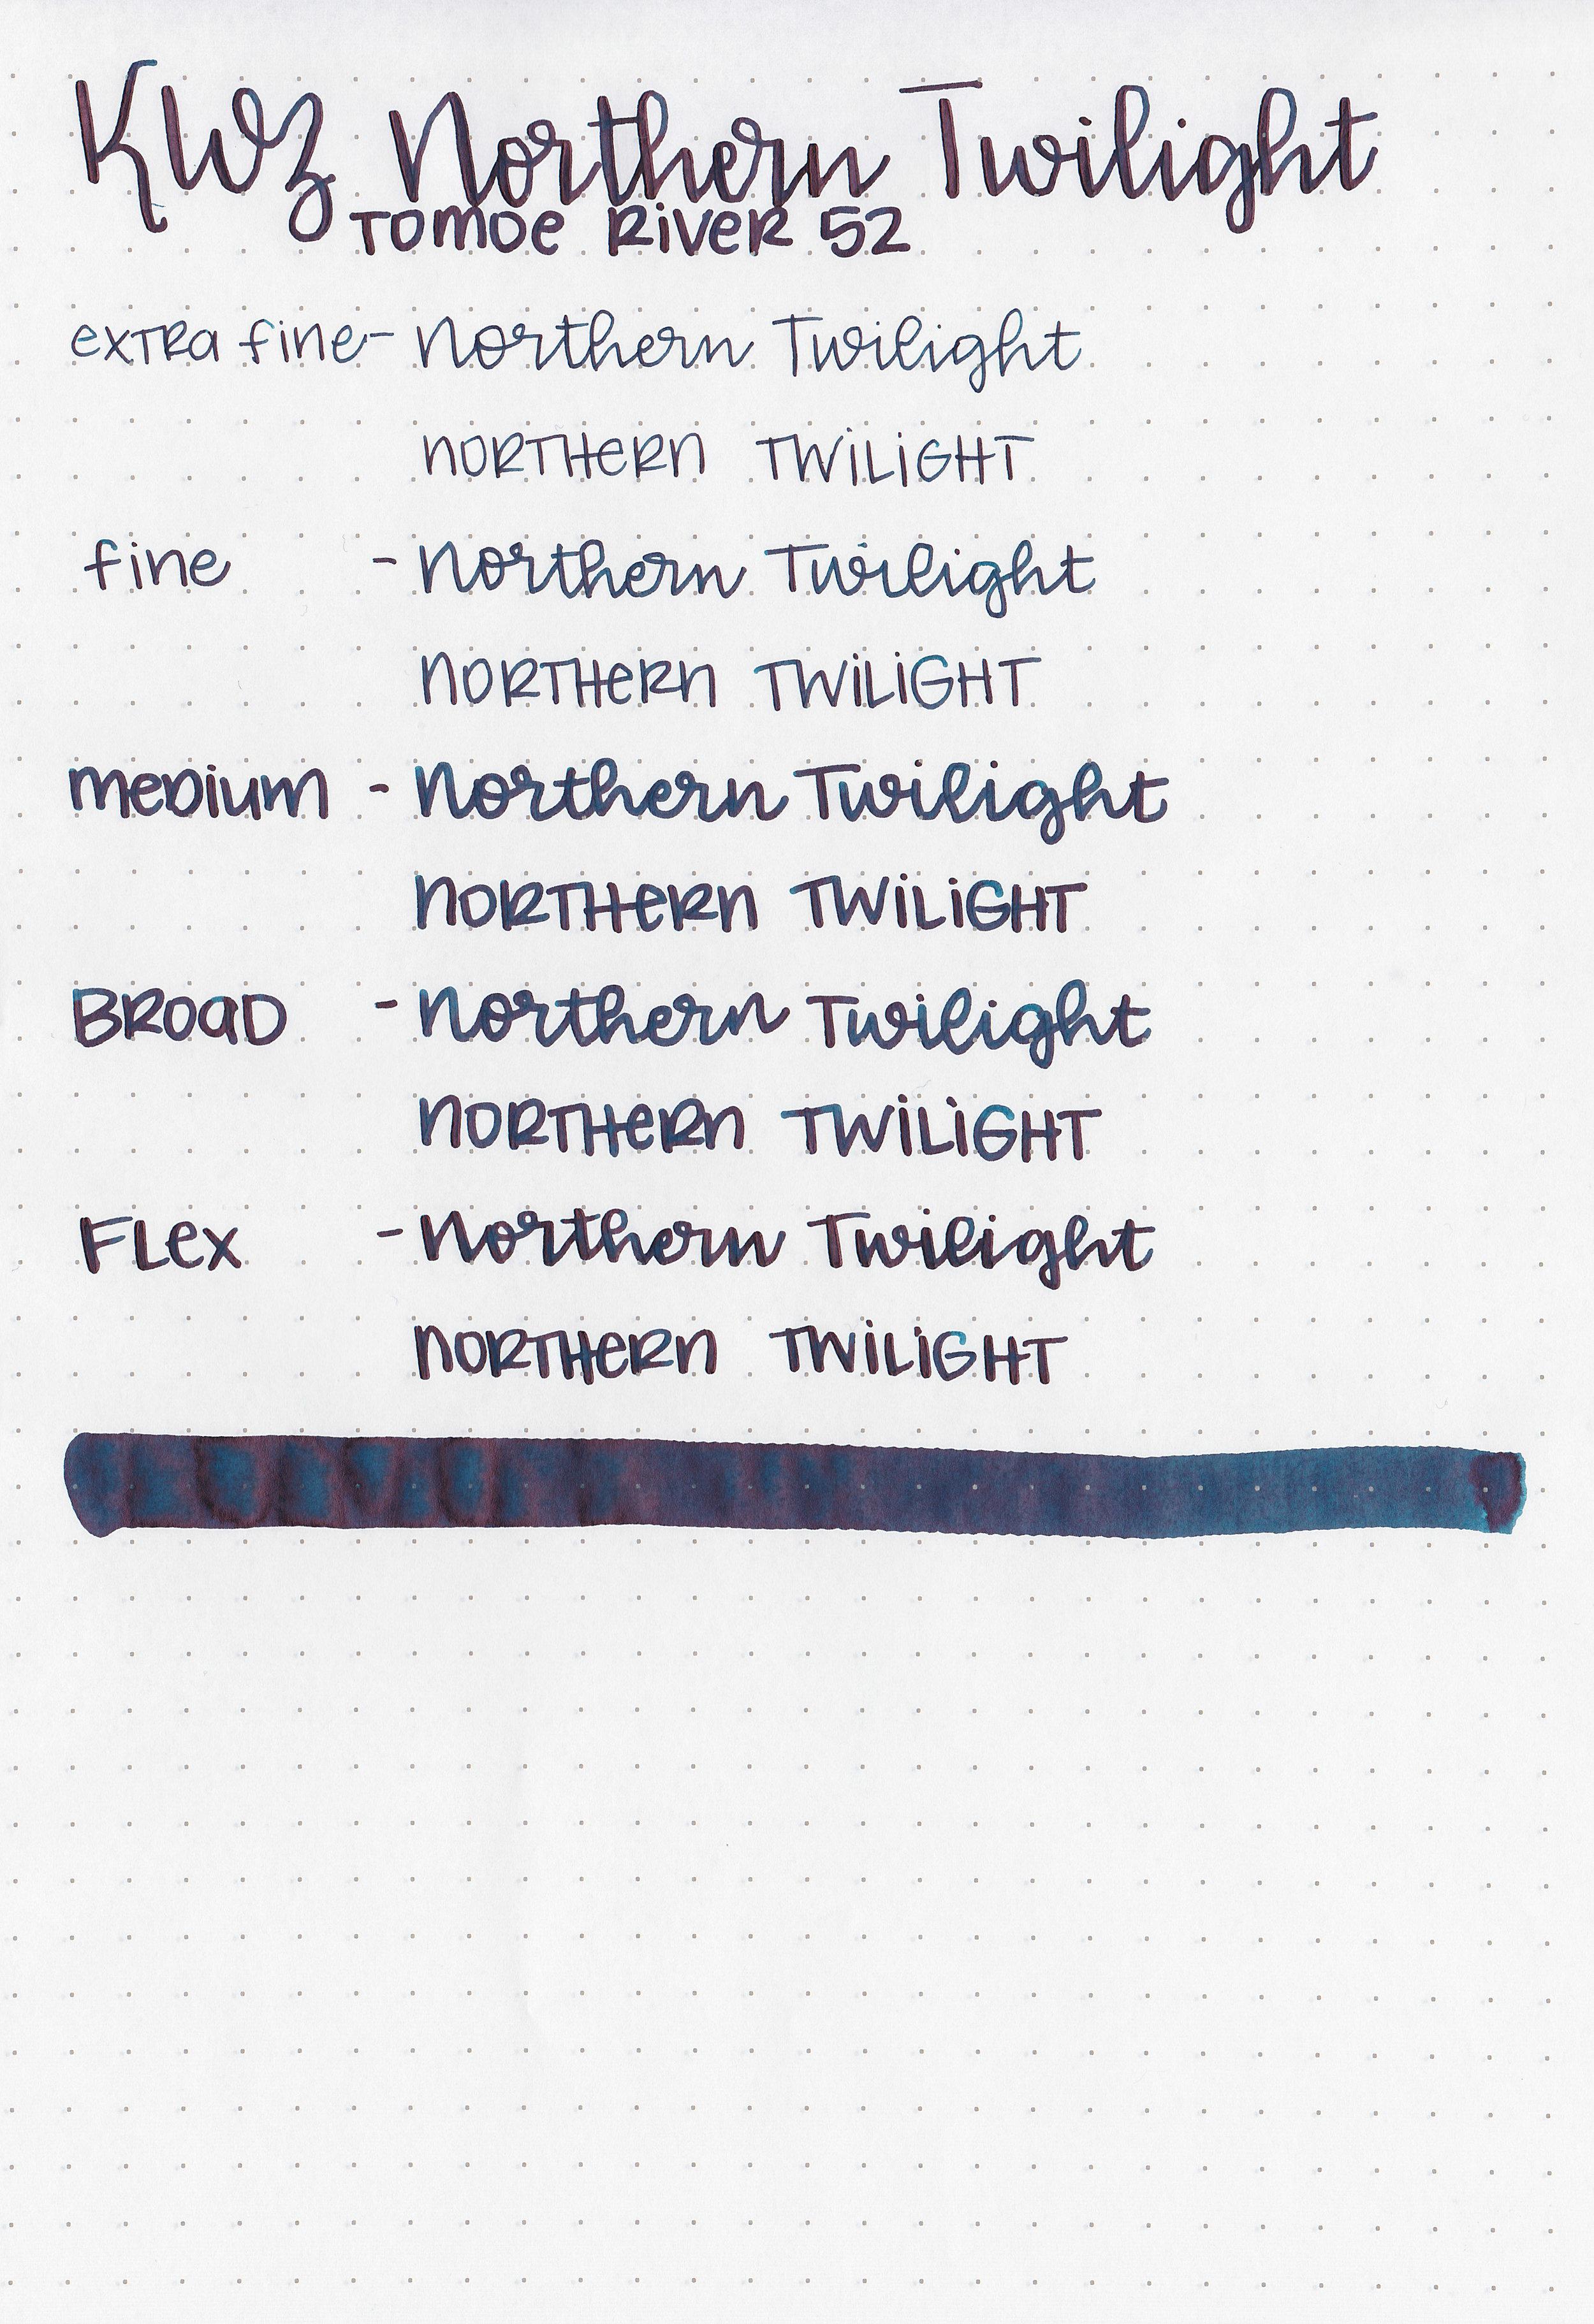 kwz-northern-twilight-5.jpg